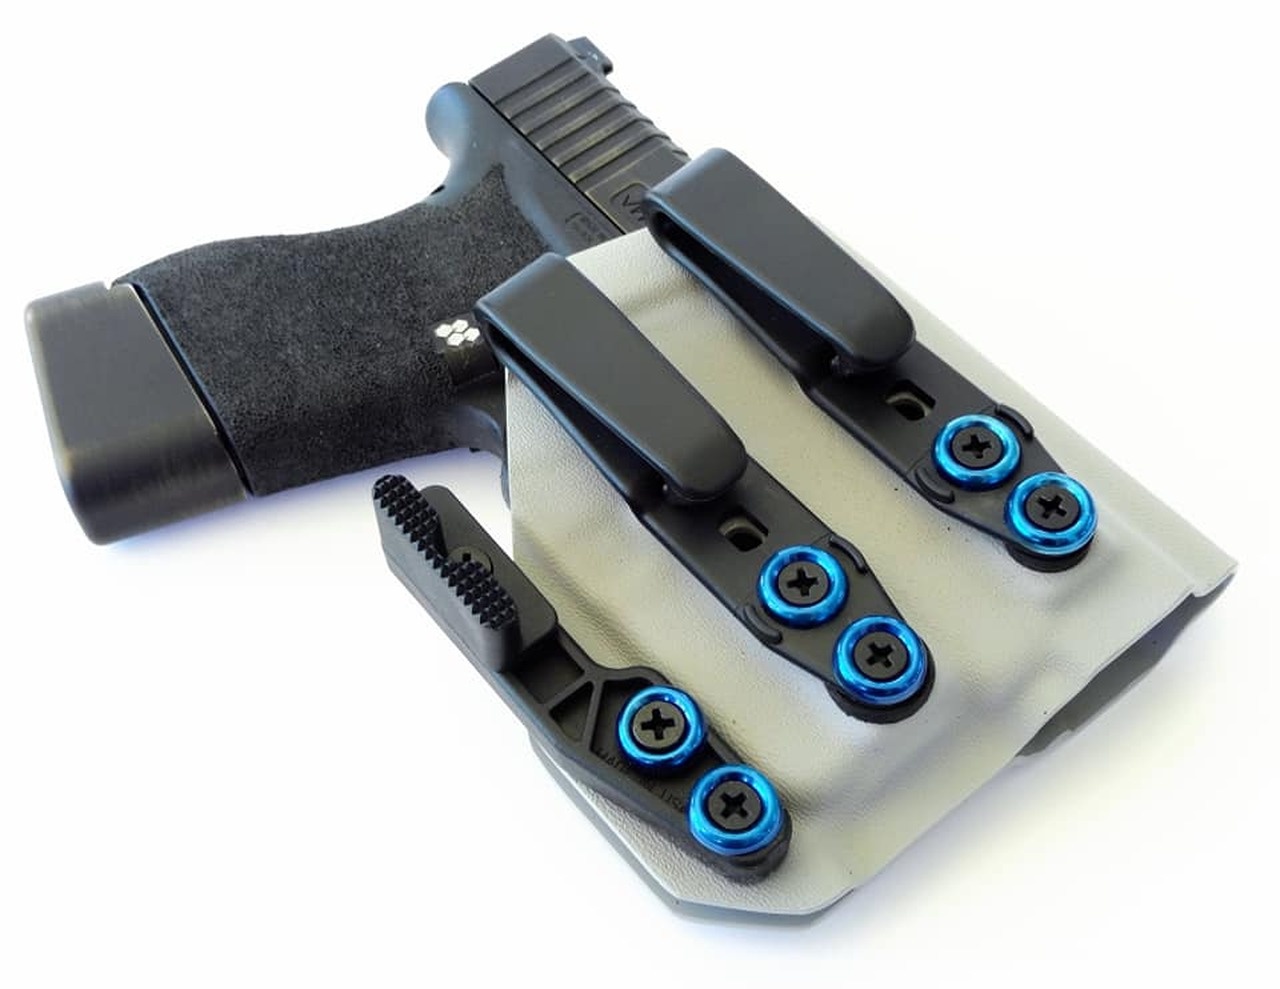 Glock 43x TLR6 Light Bearing Holster